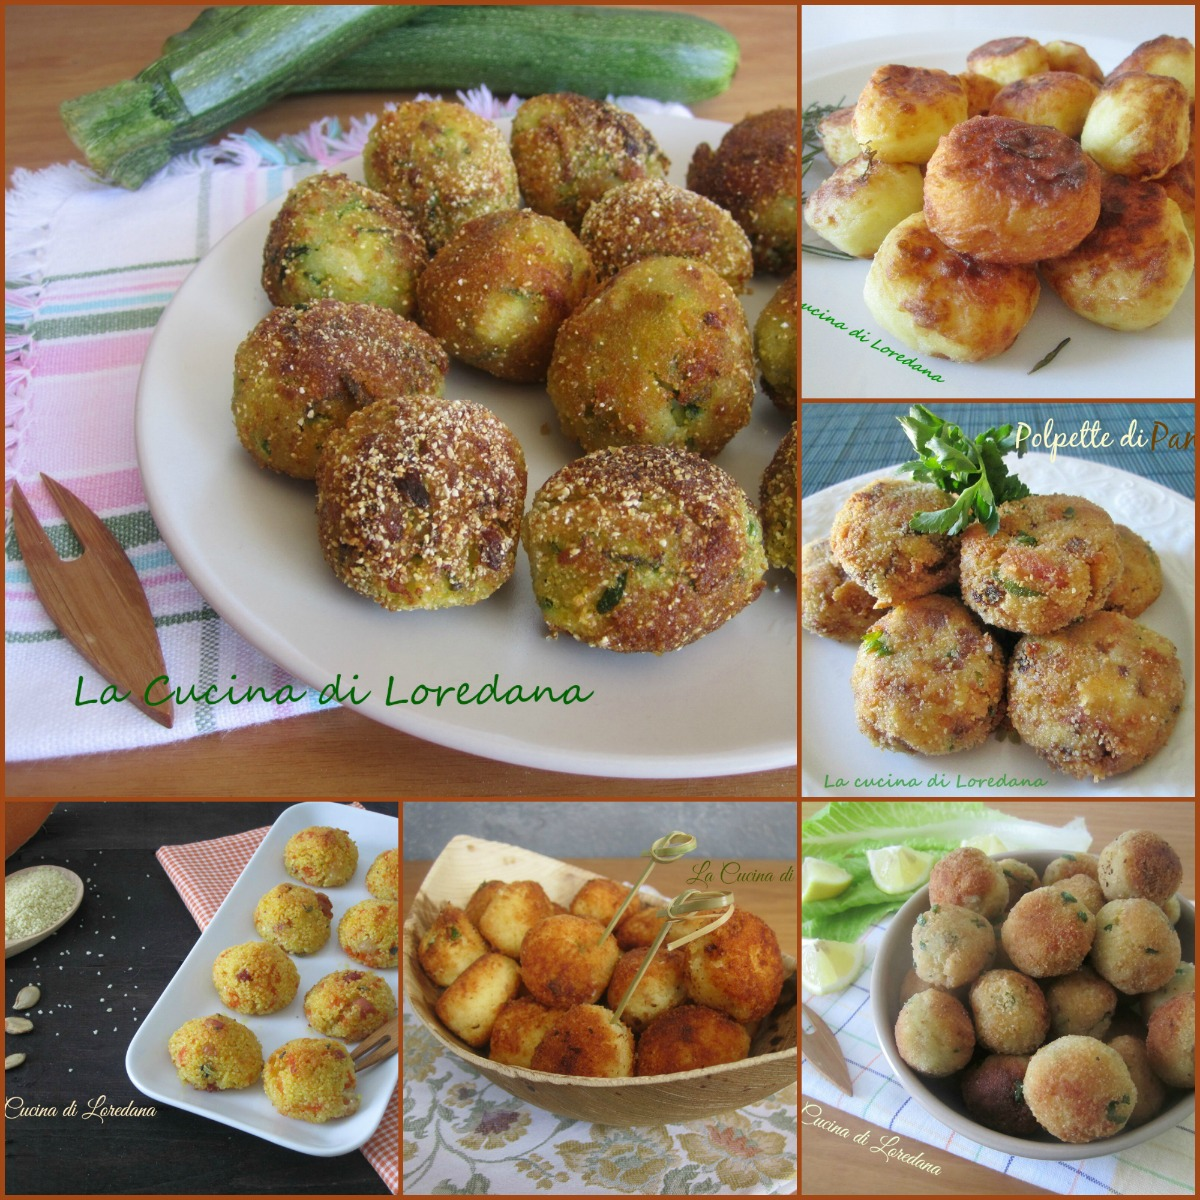 Cucina di loredana casamia idea di immagine - Cucina con loredana ...